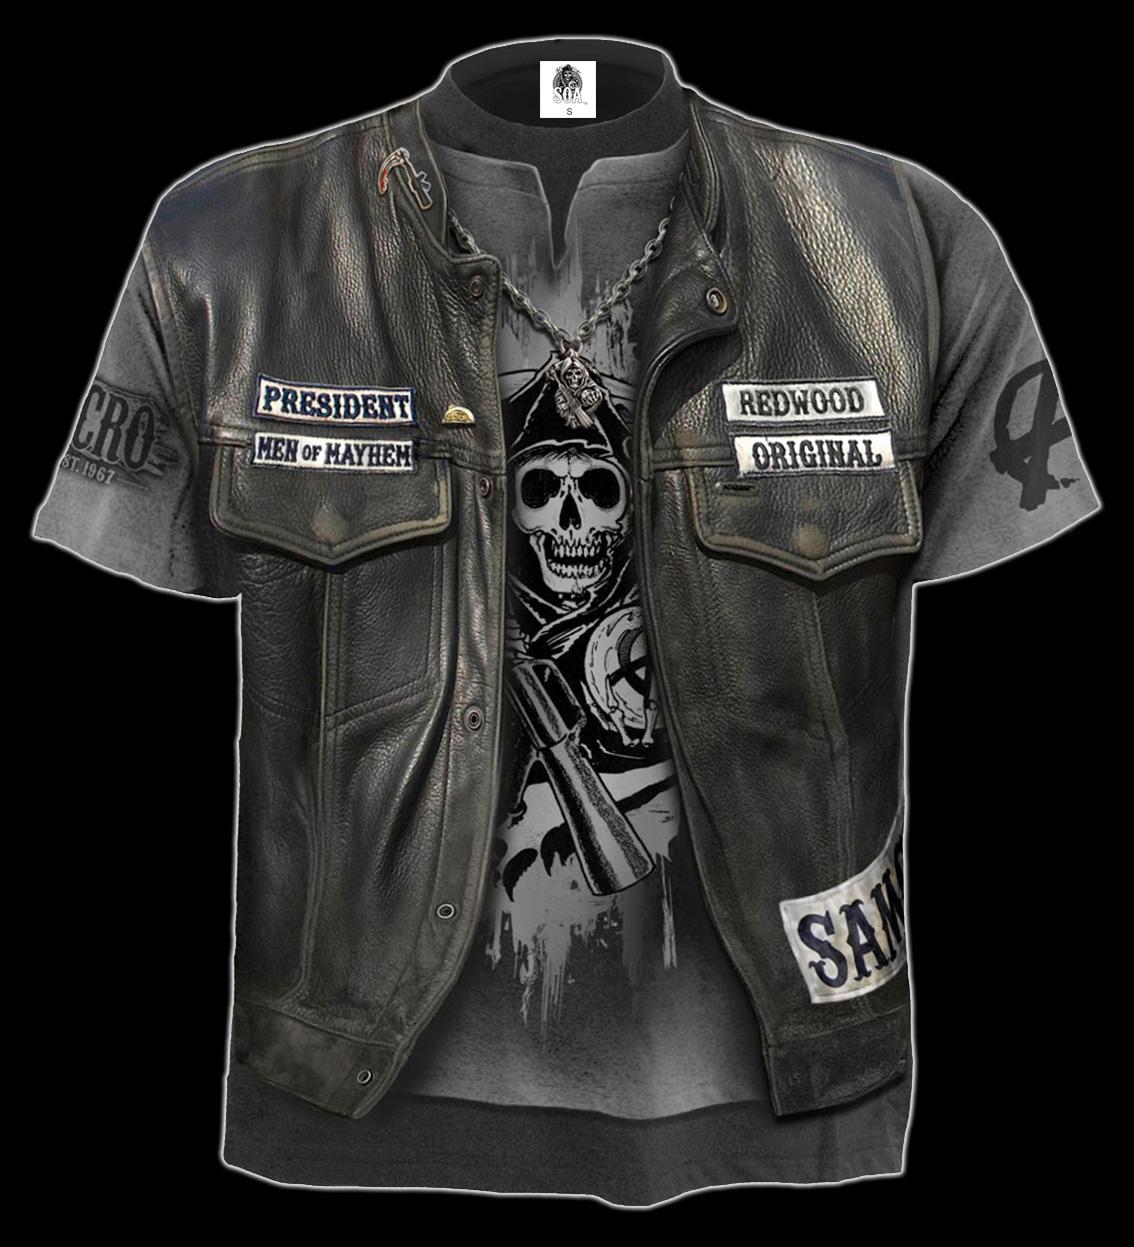 Sons Of Anarchy Redwood Originals Premium Adult Slim Fit T-Shirt